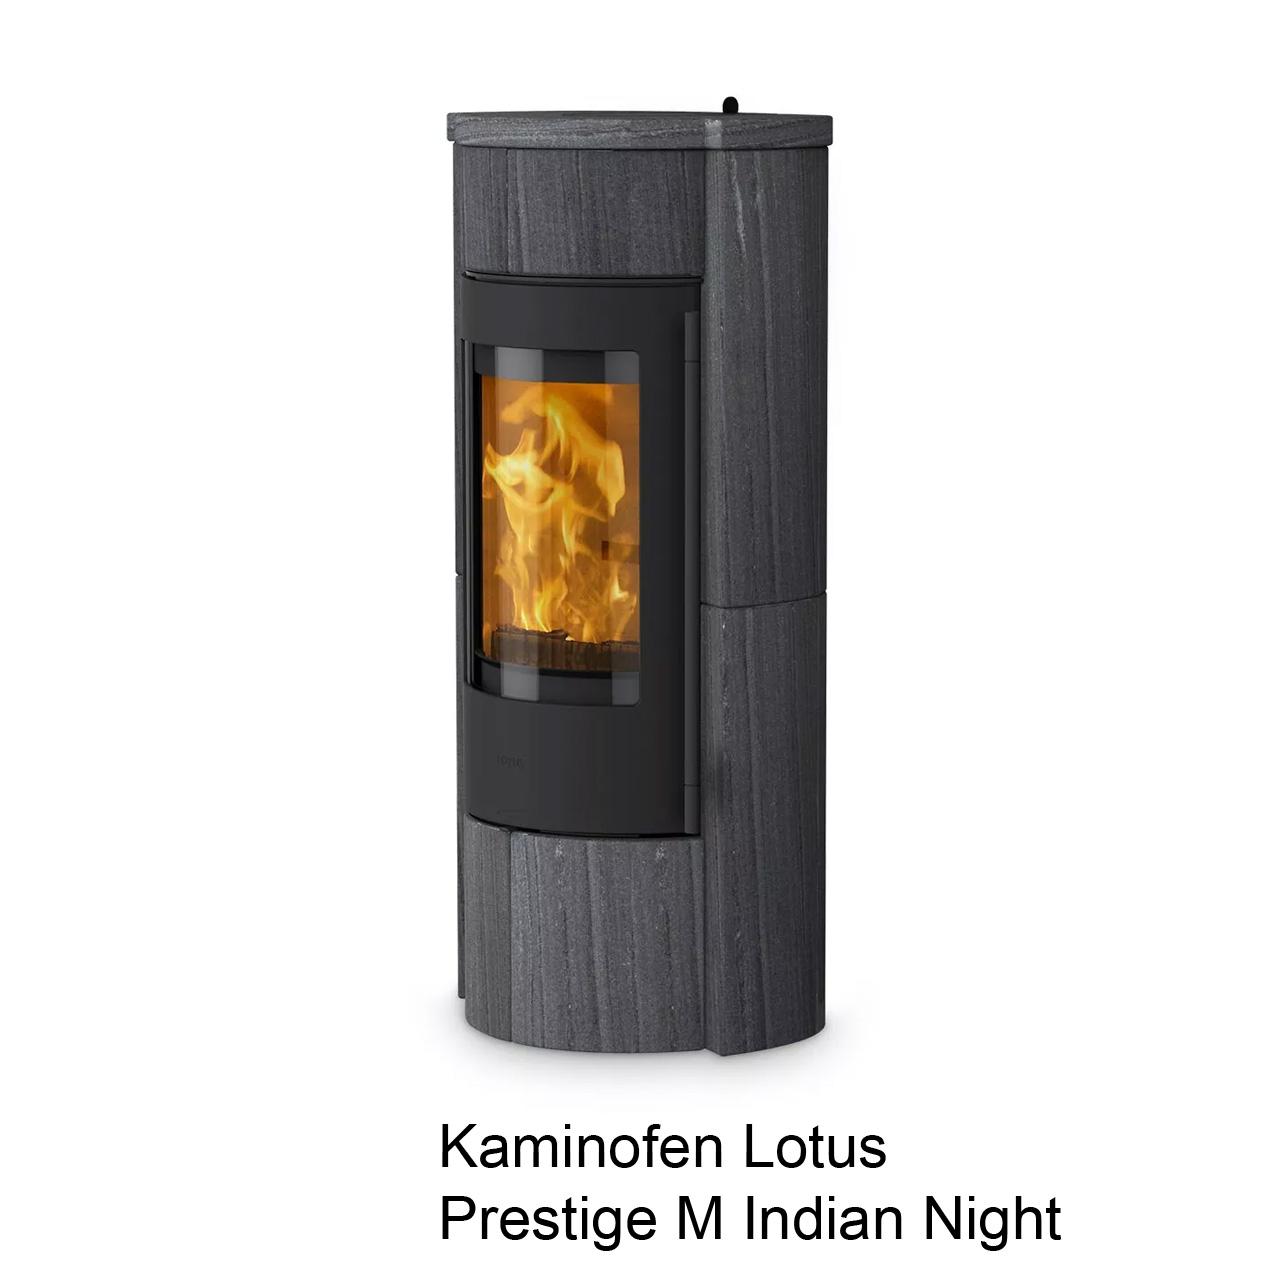 Bild des Kaminofens Lotus Prestige M